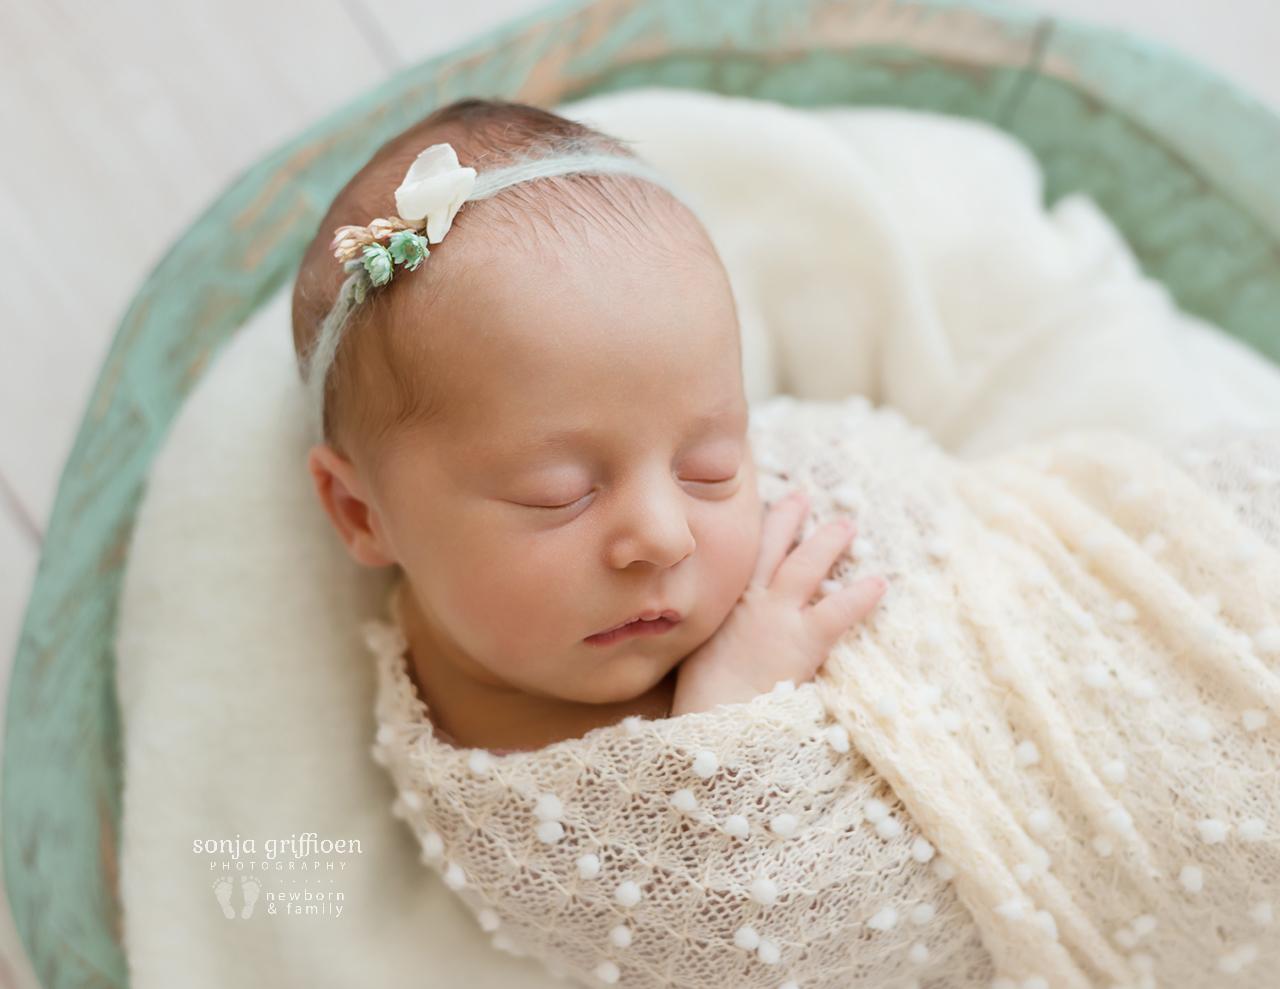 Everlyn-Newborn-Brisbane-Newborn-Photographer-Sonja-Griffioen-11.jpg